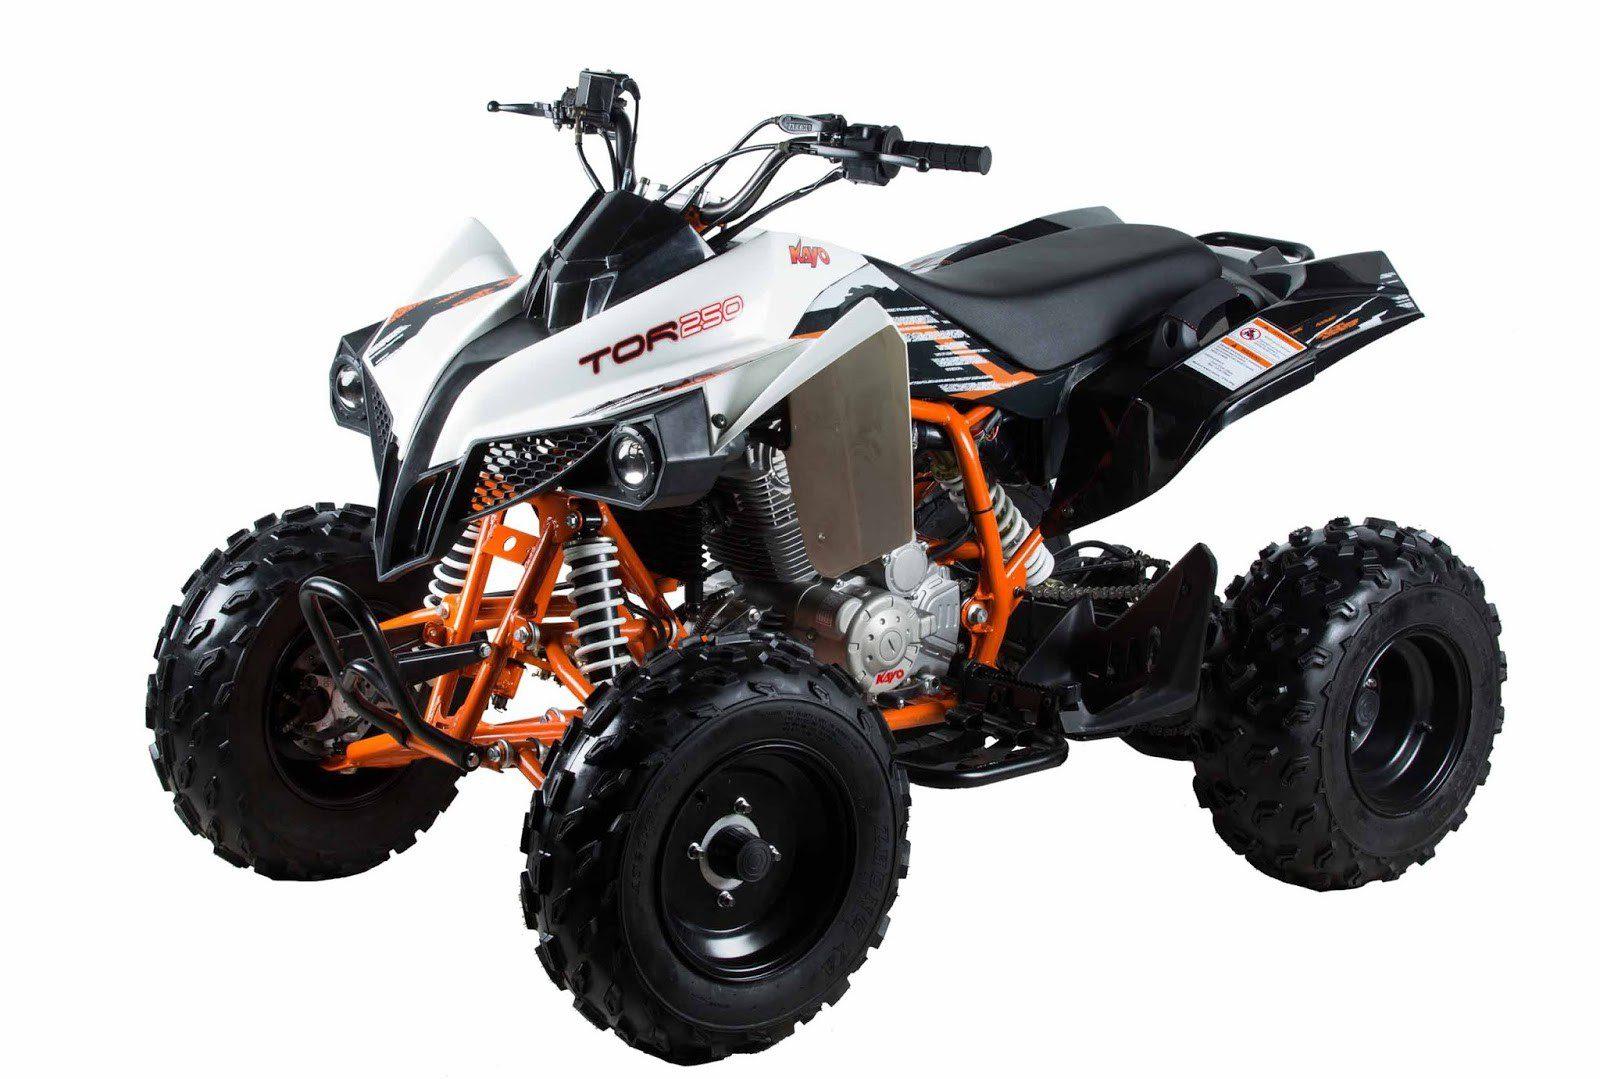 ATV Tor 250